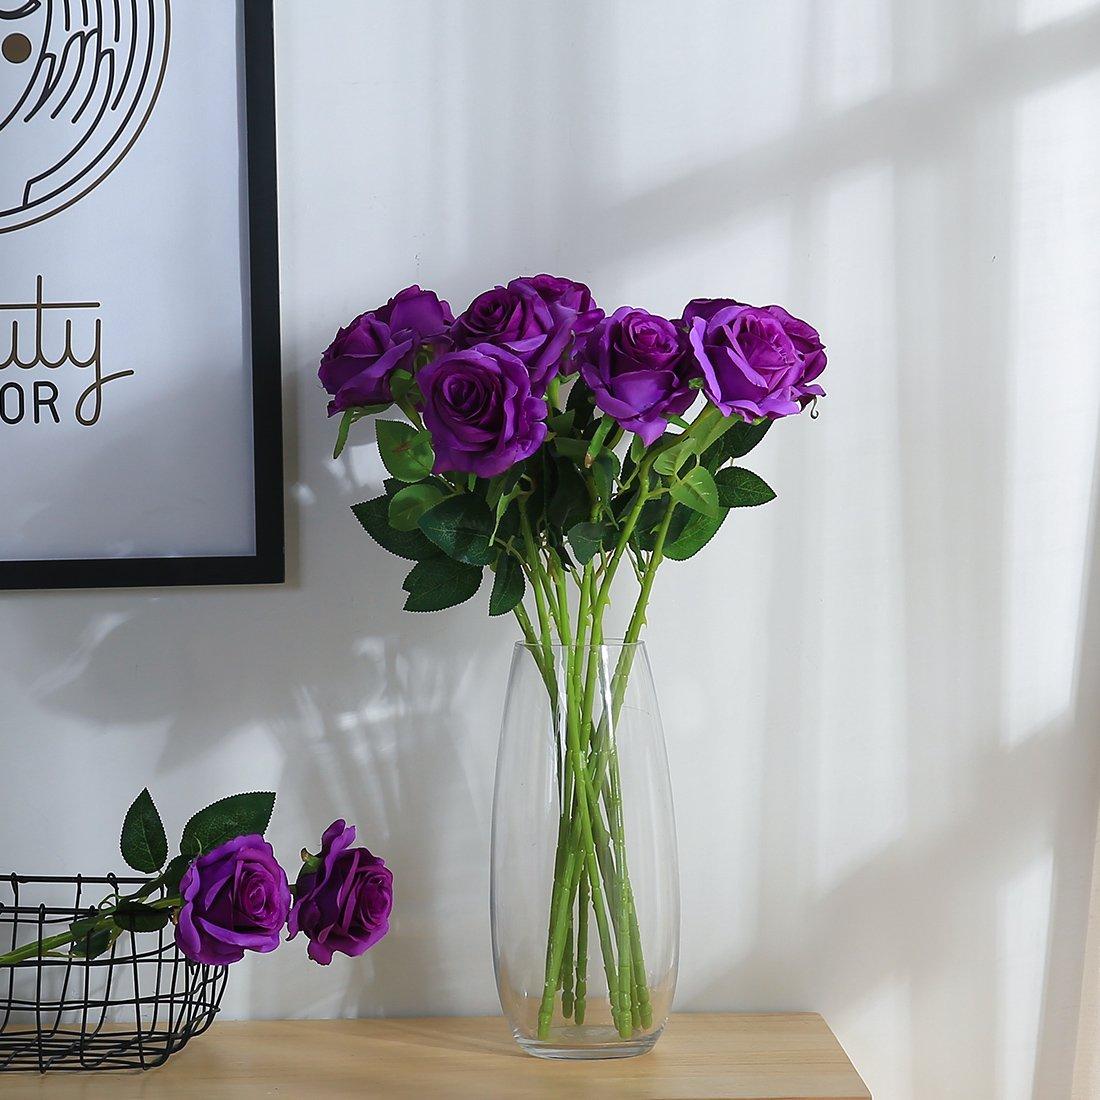 JUSTOYOU 10pcs Artificial Rose Silk Flower Blossom Bridal Bouquet for Home Wedding Decor(Purple)